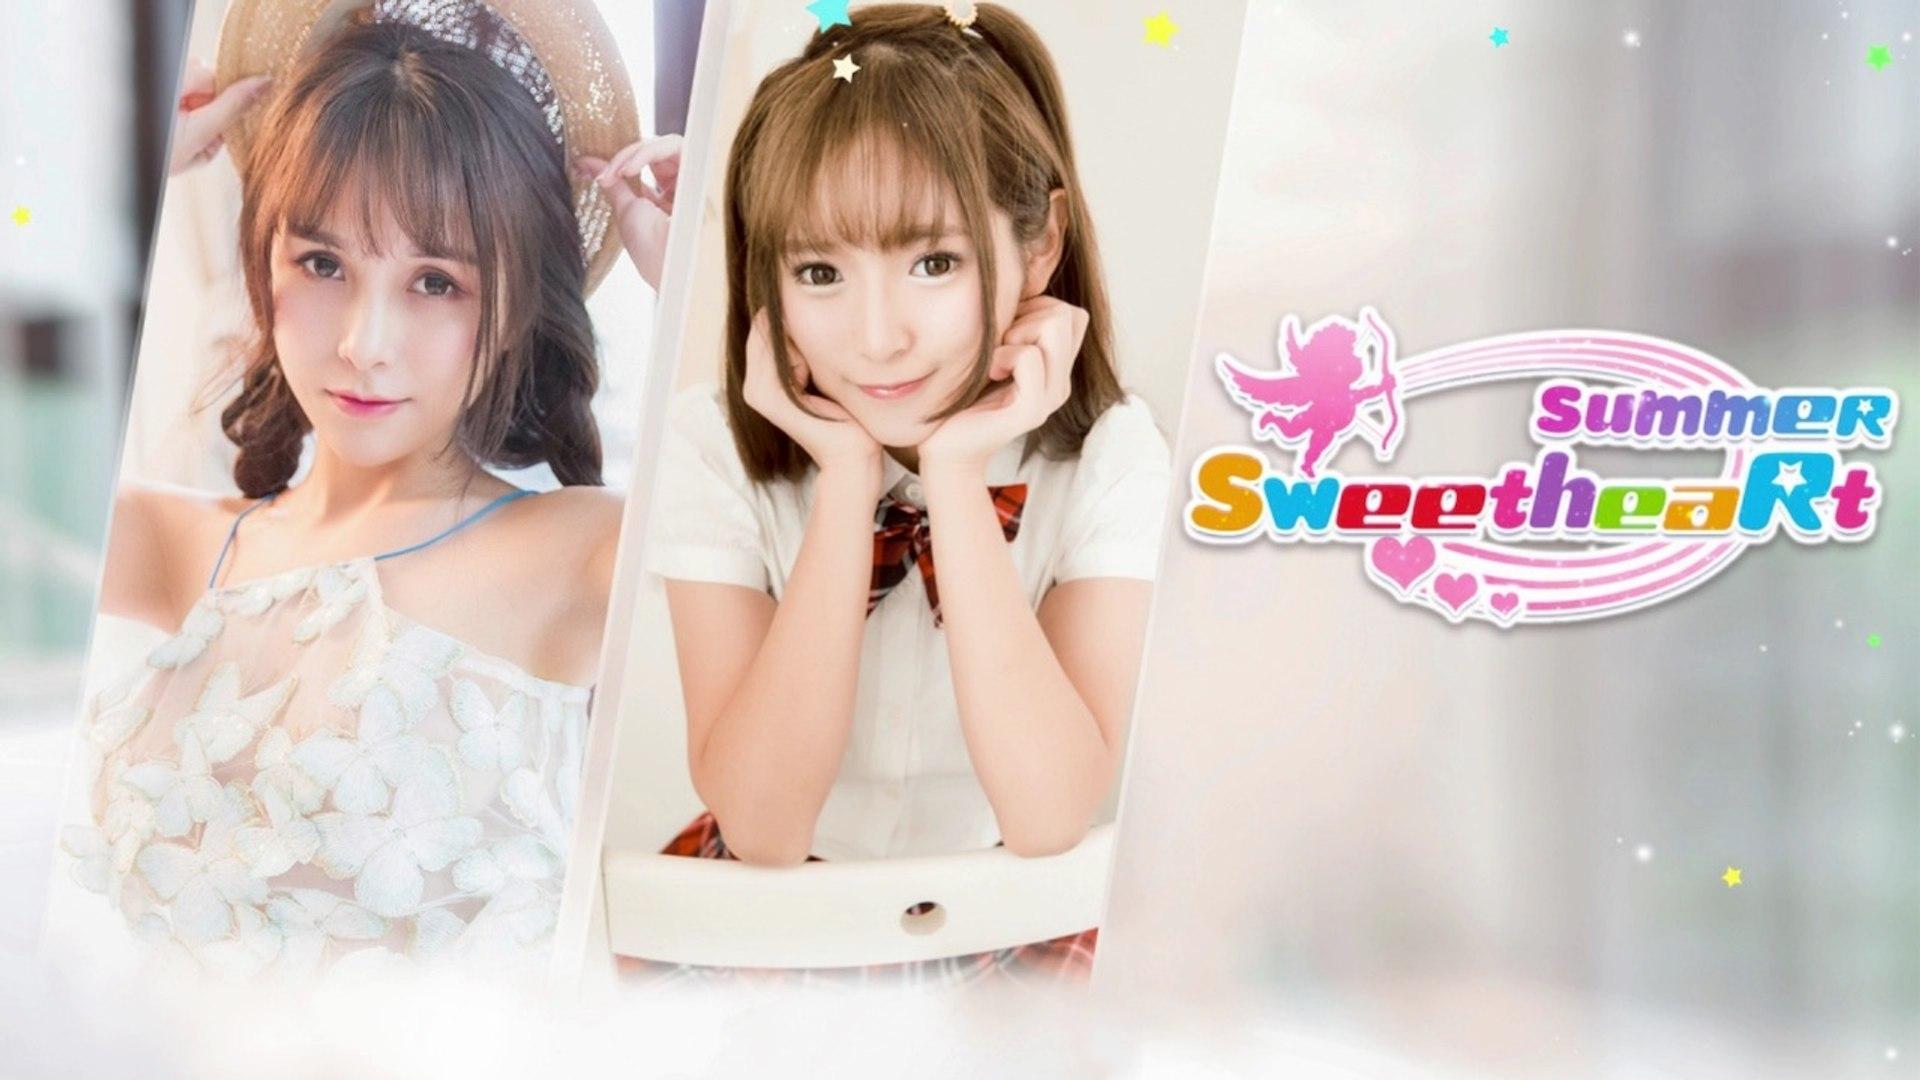 Китайский Симулятор Свиданий с Живыми Актерами - Summer Sweetheart (Switch)